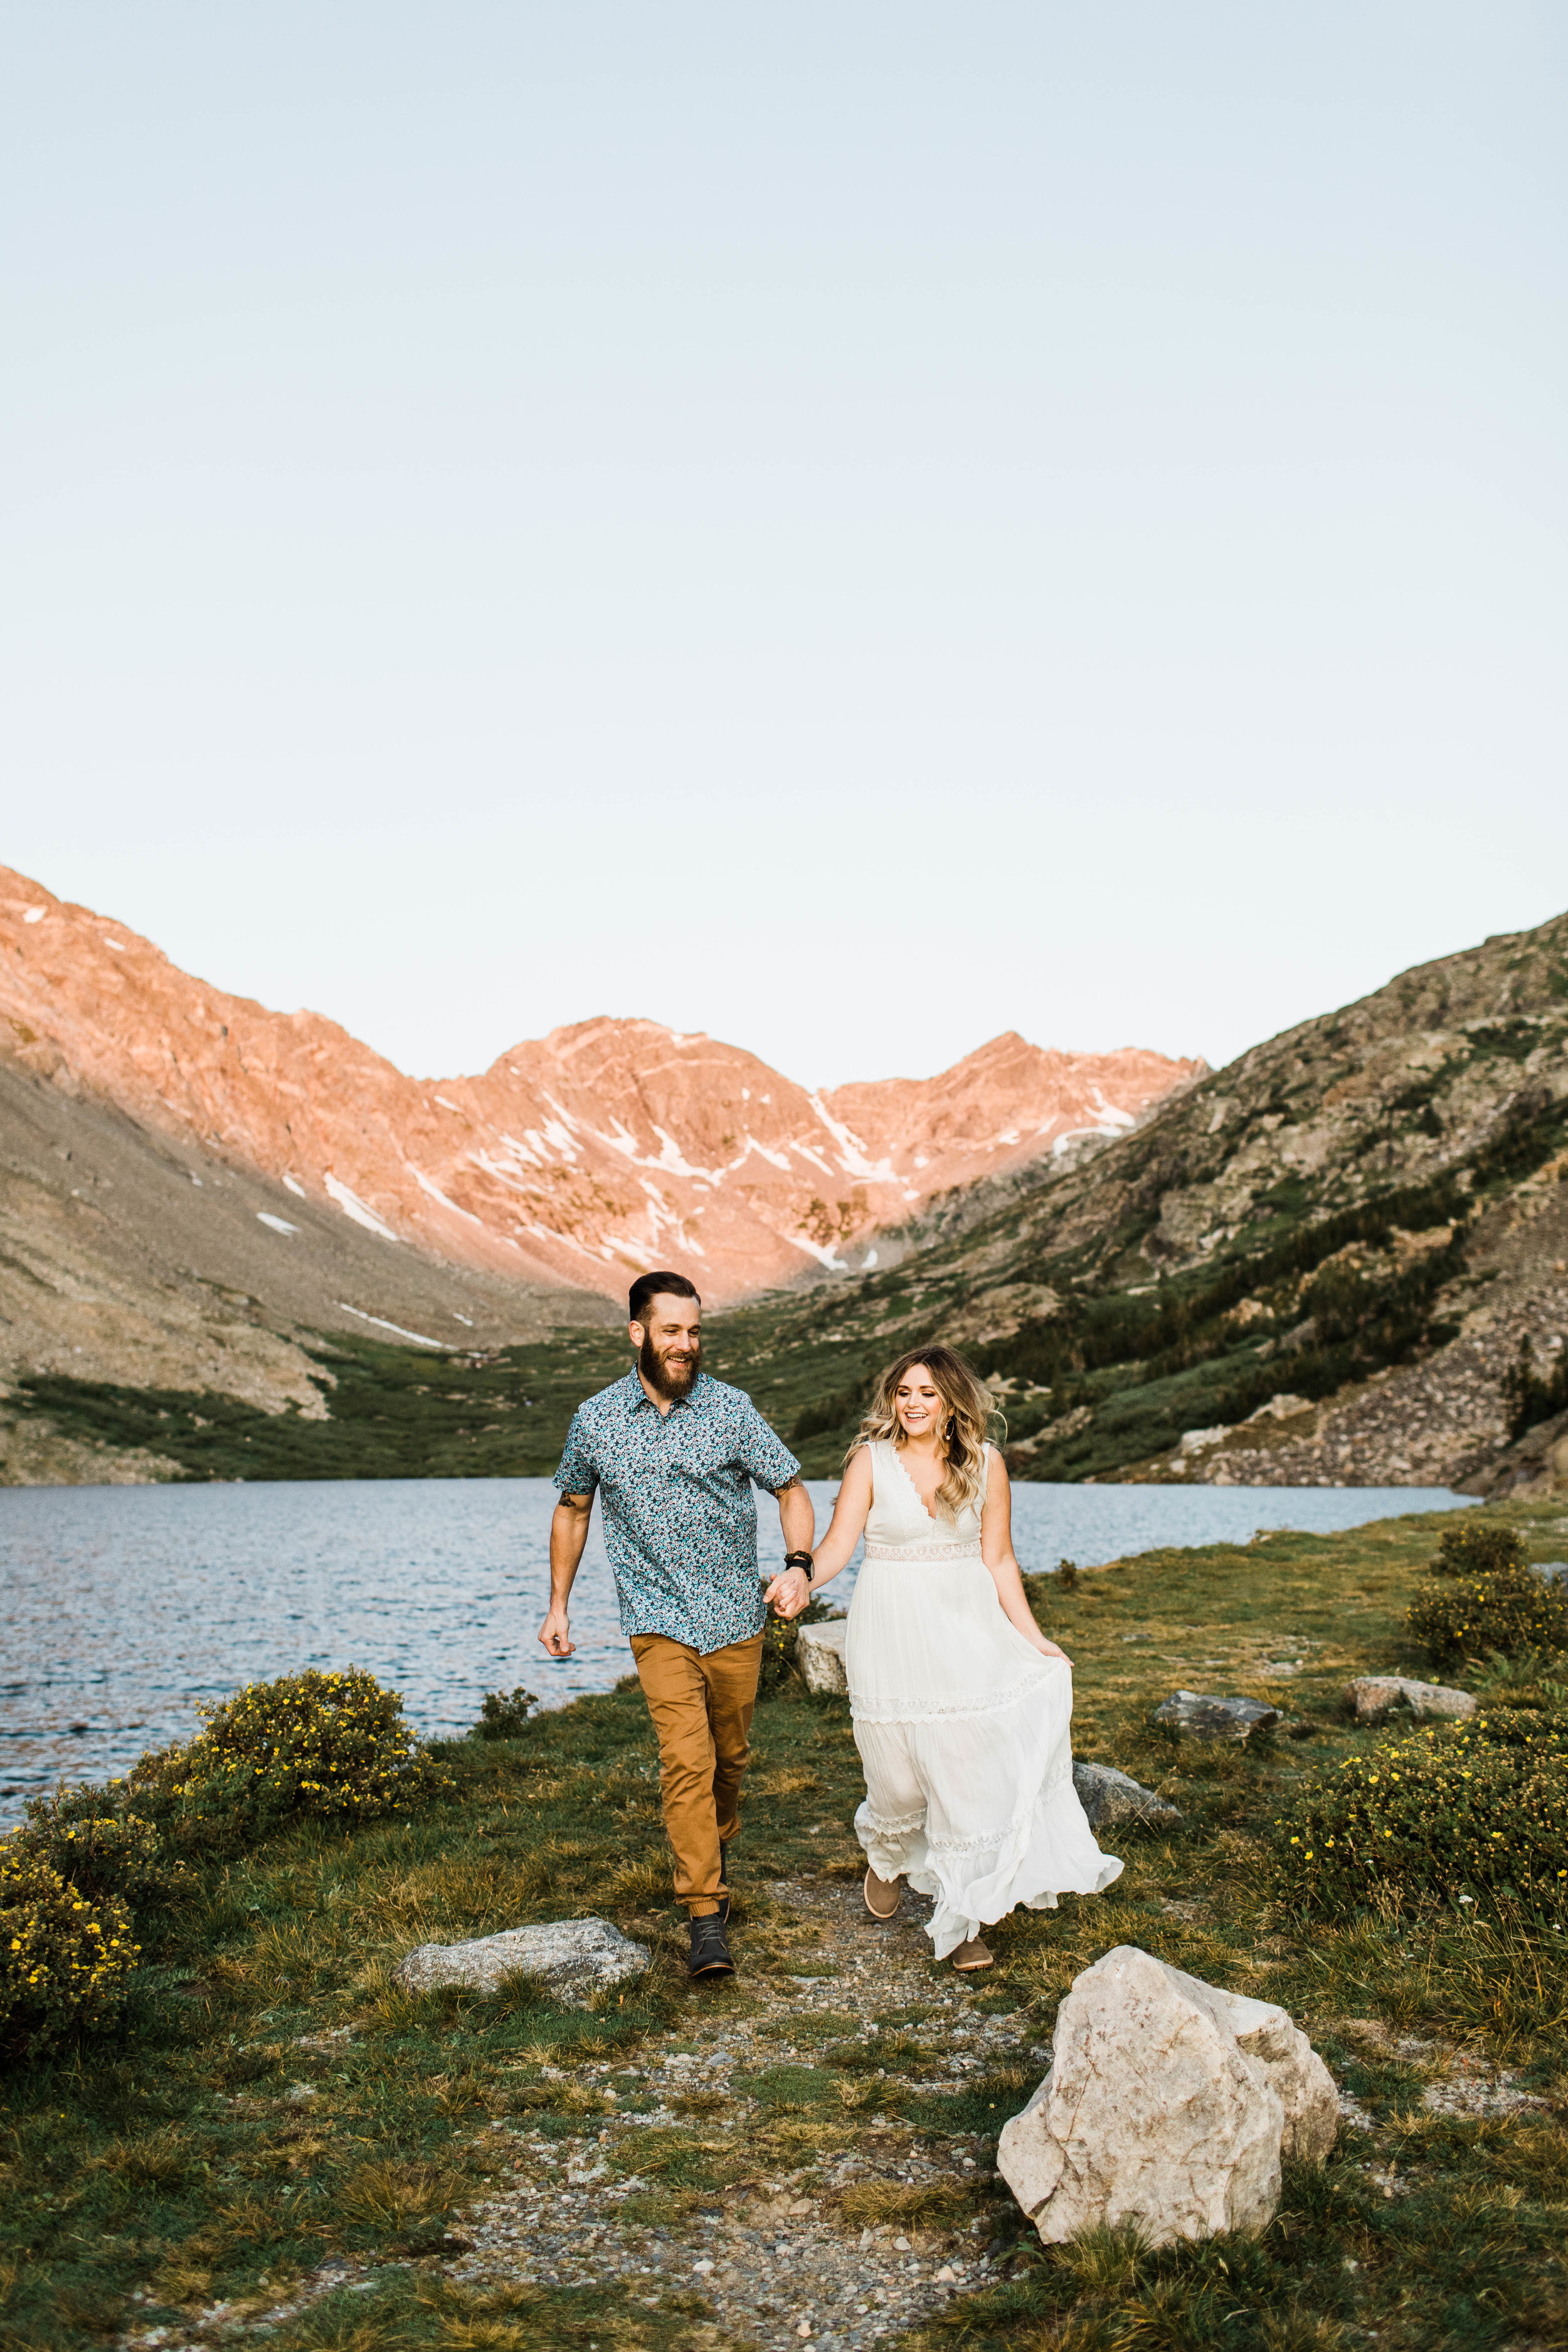 Alpine lake elopement at sunrise in Breckenridge Colorado